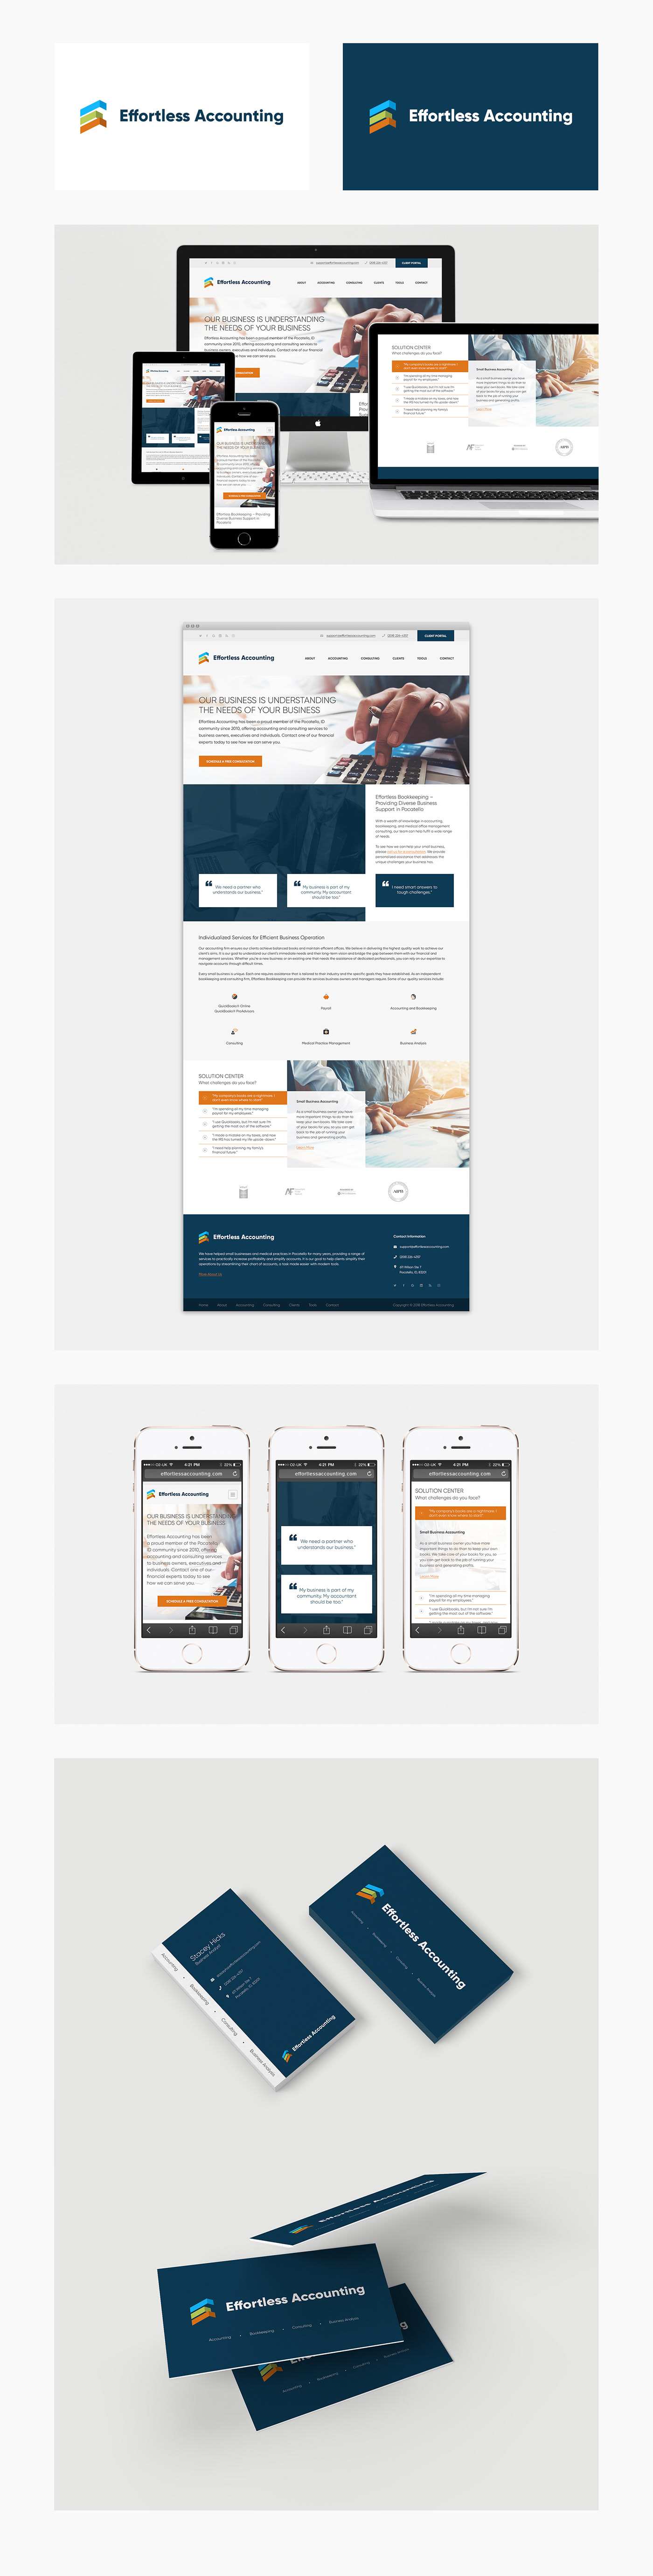 Website Design business card Logo Design branding